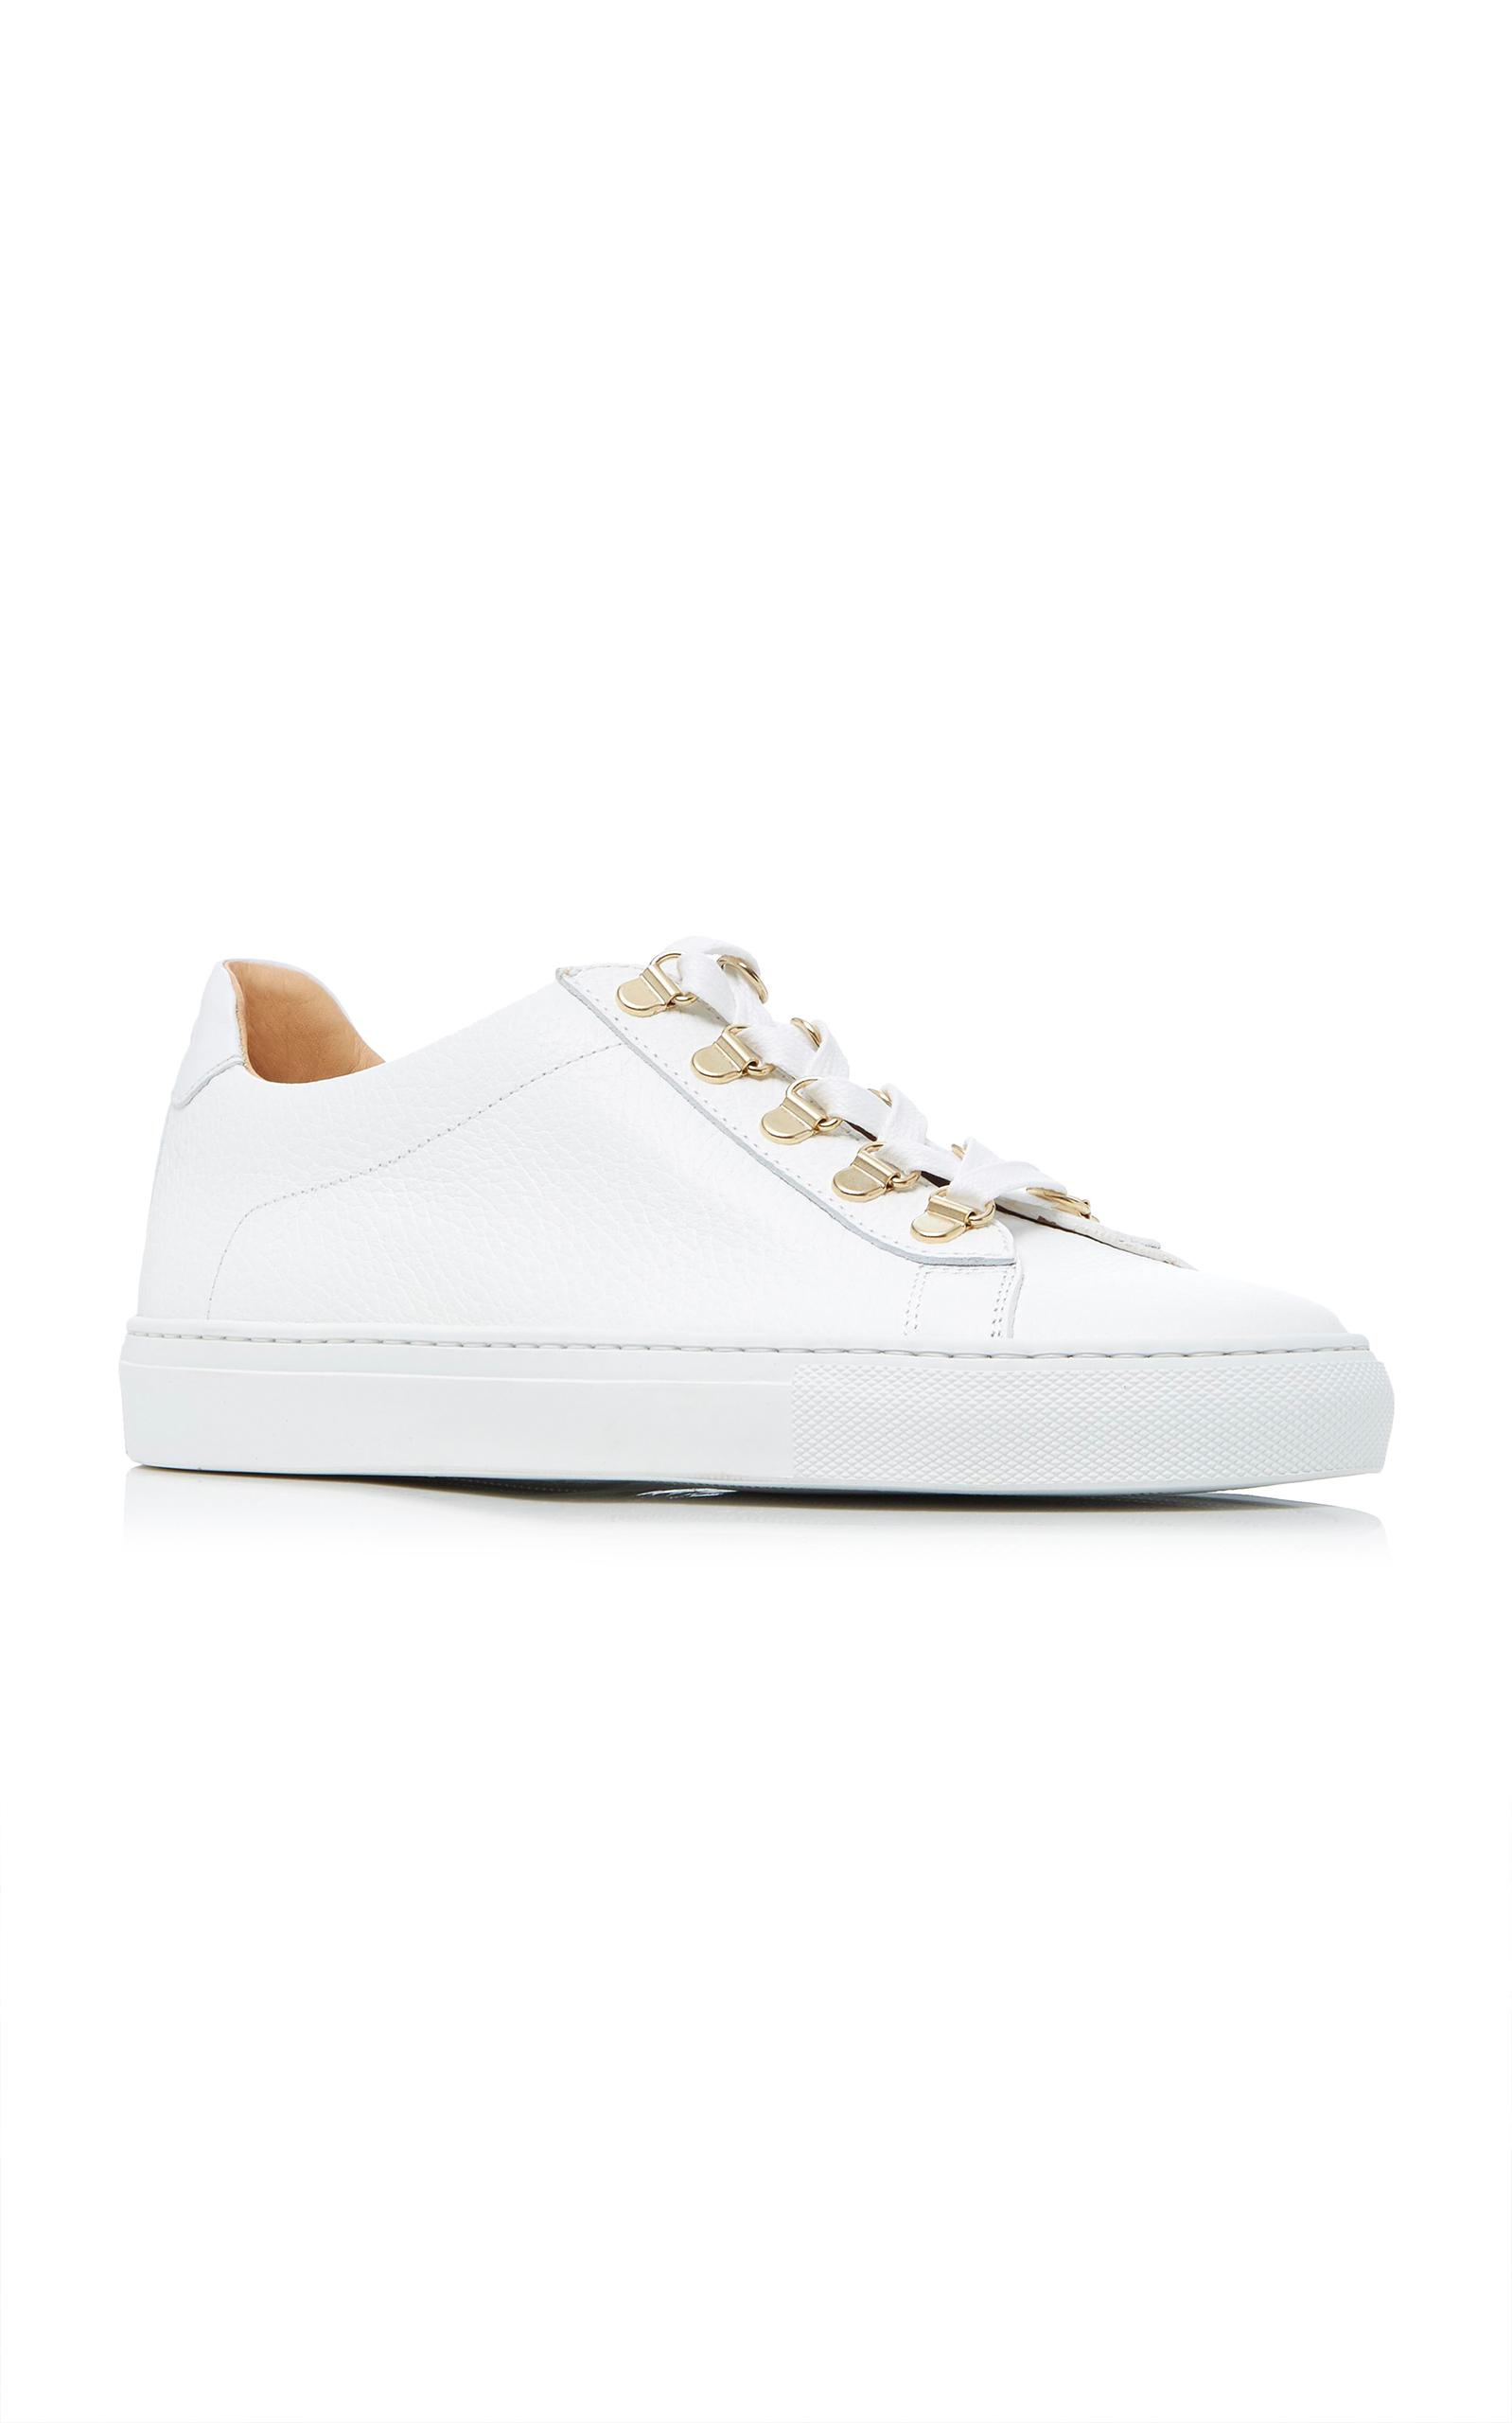 Gavia Bianco sneakers - White KOIO z5dwVy8O